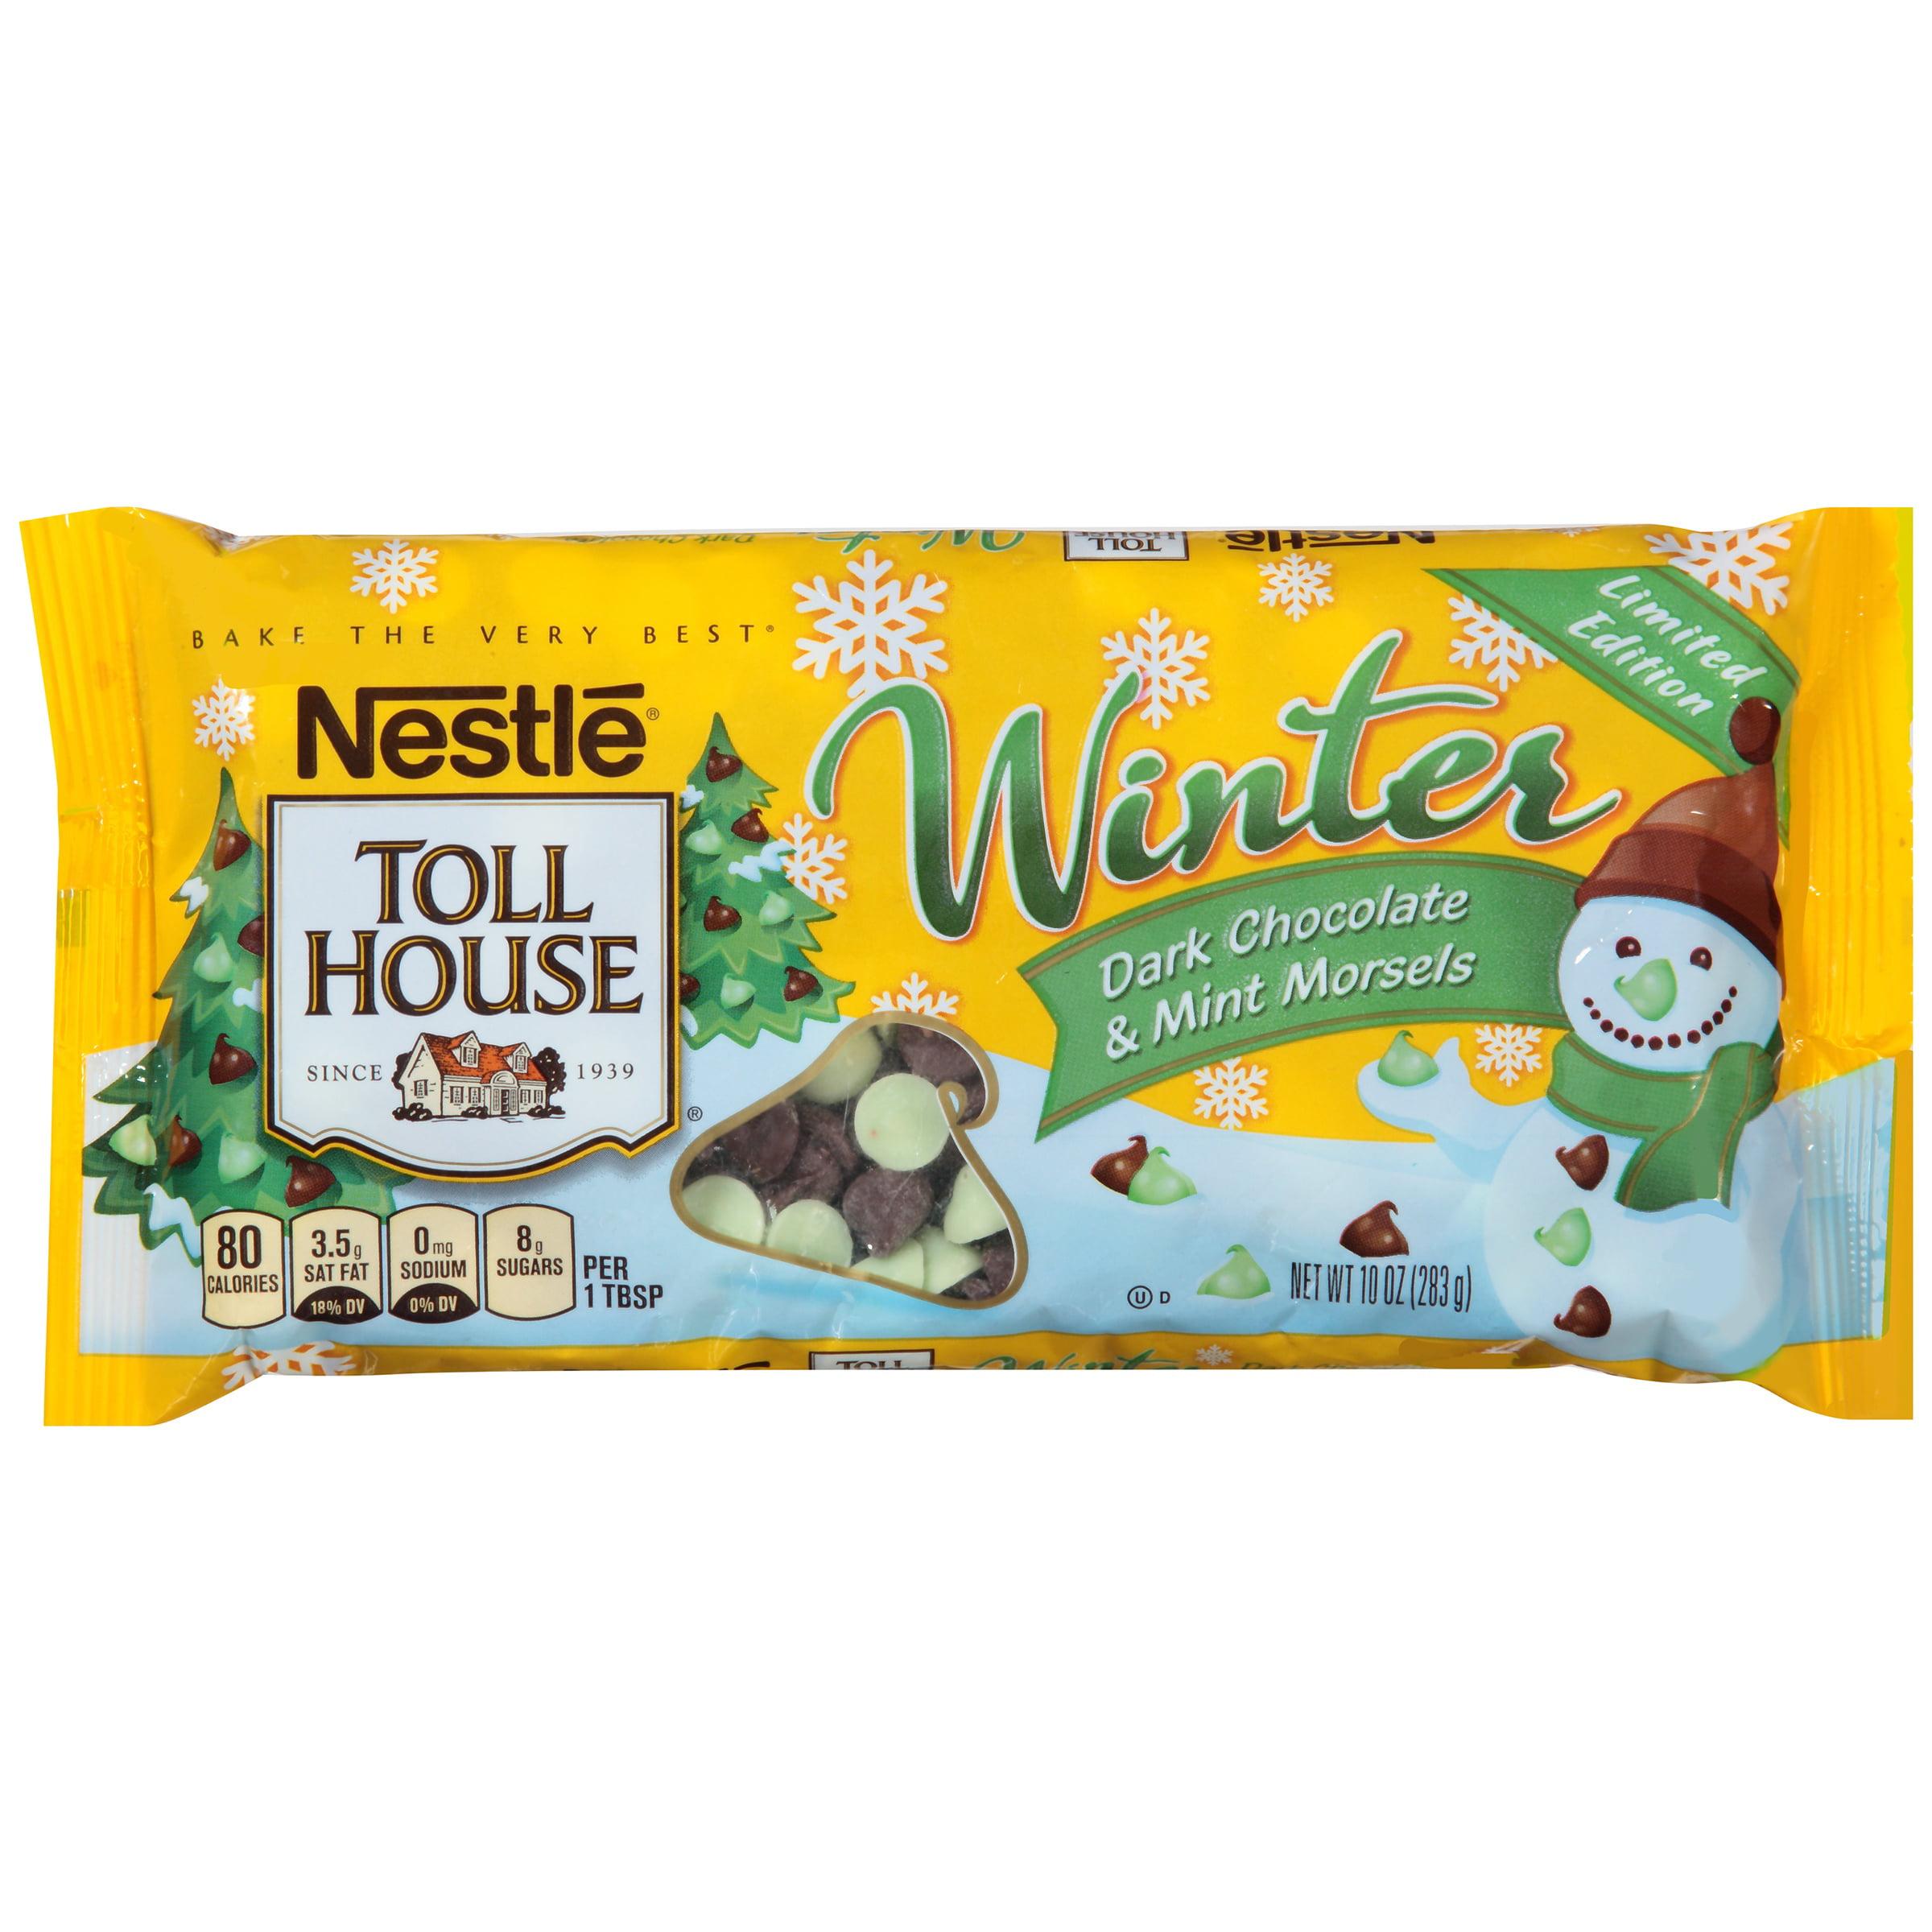 (4 Pack) NESTLE TOLL HOUSE Winter Dark Chocolate & Mint Morsels 10 oz. Bag